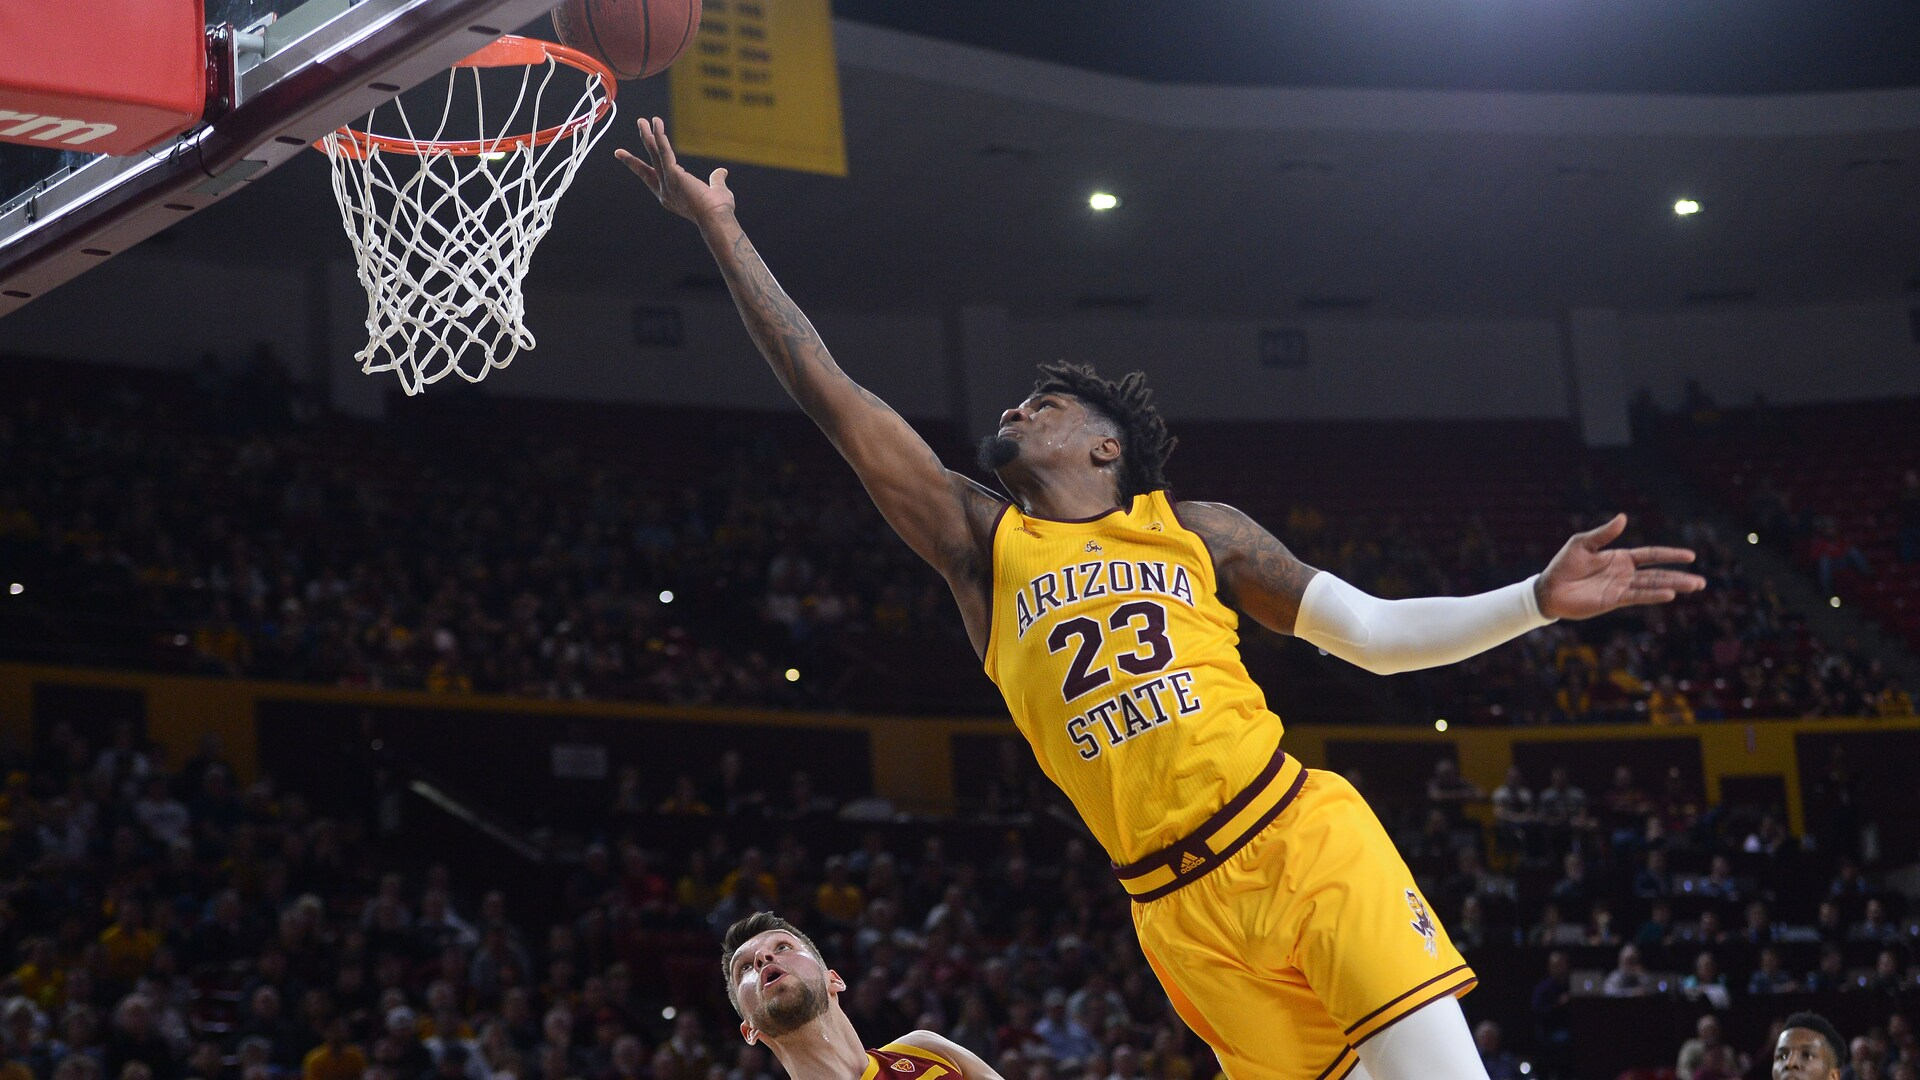 Arizona State's White declares for NBA Draft